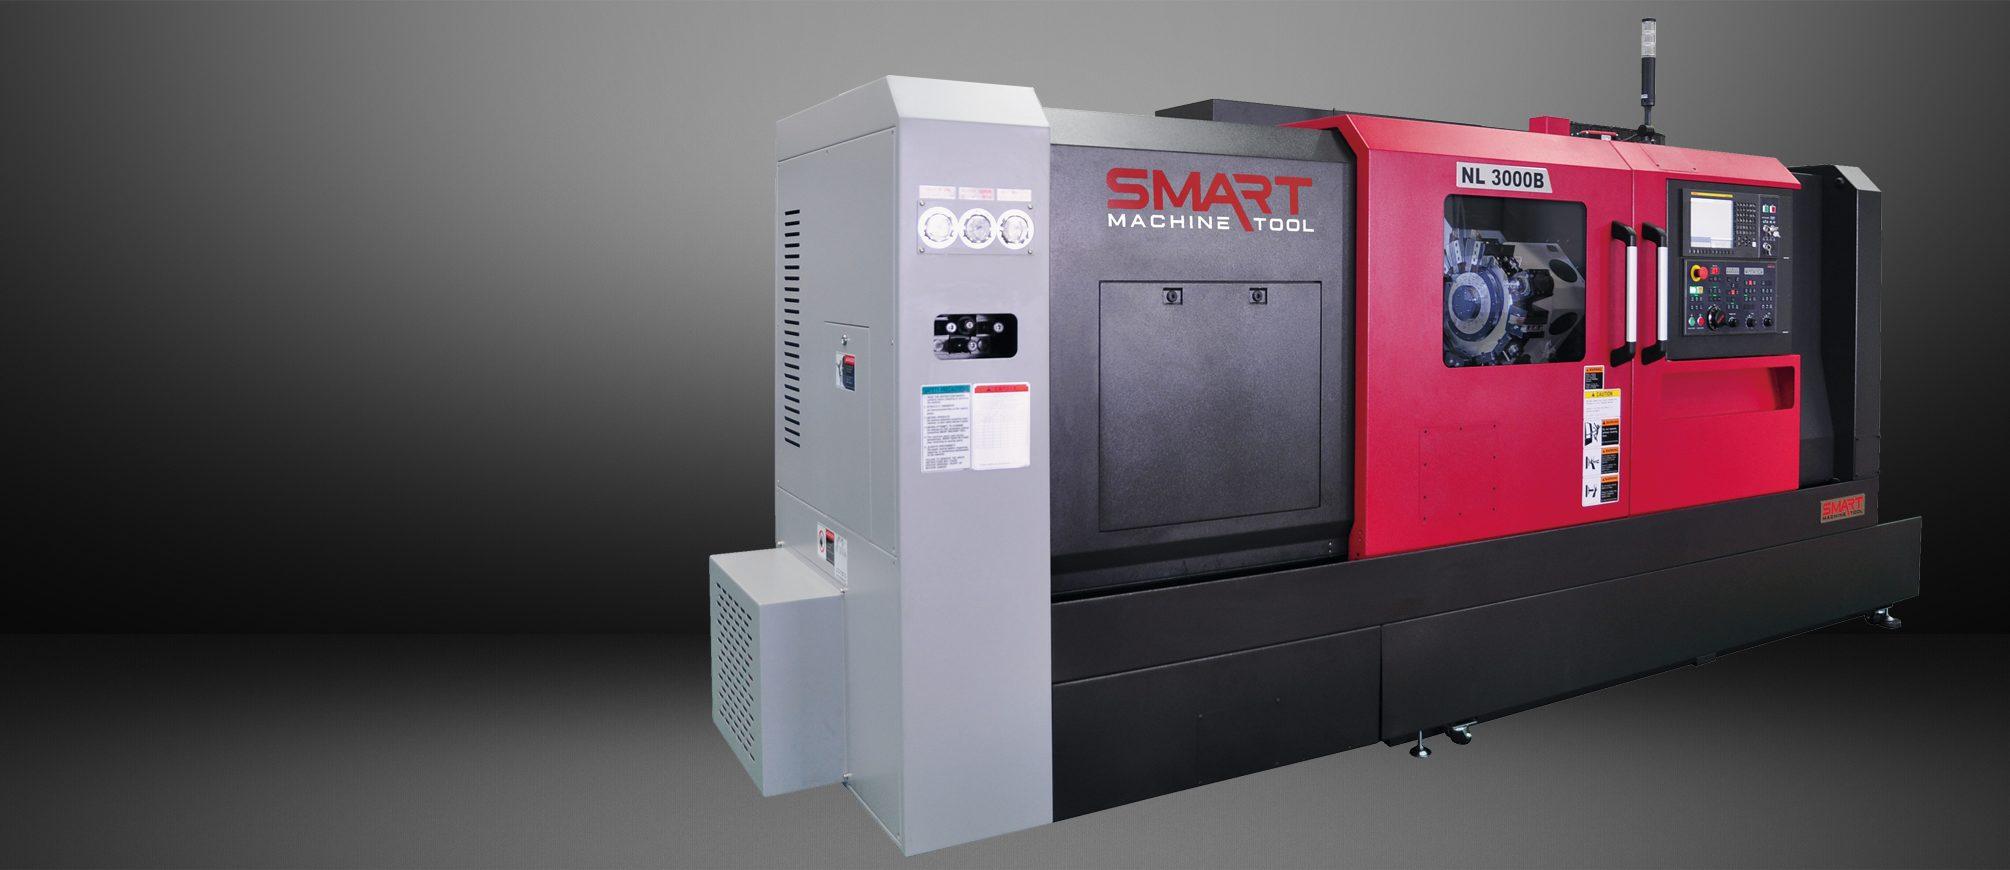 SMART NL 3000B – BOX WAY – (12″ CHUCK) 2-Axis CNC Lathes